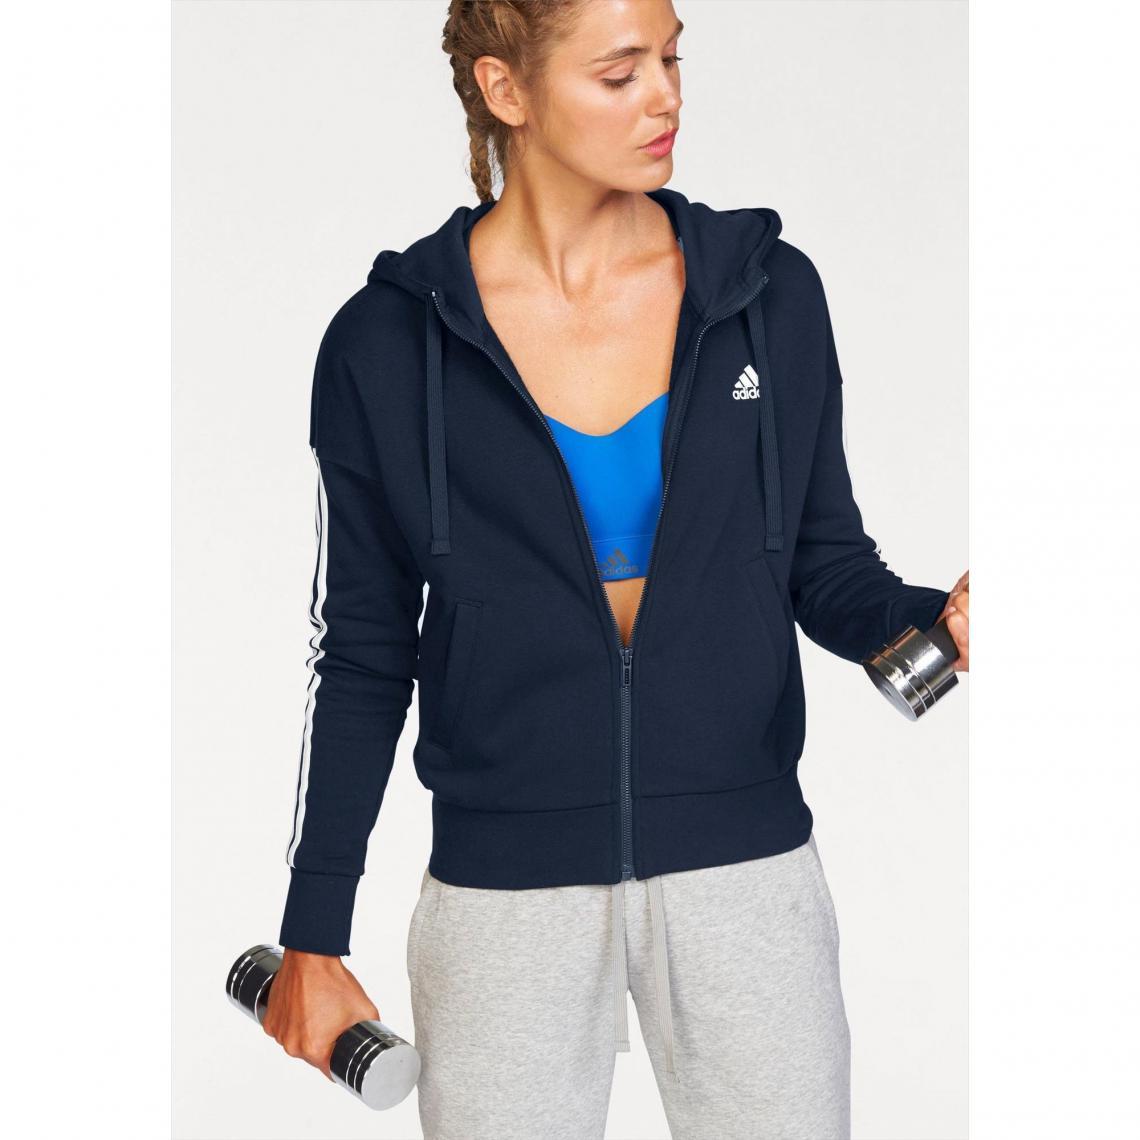 8203536b6253 Sweat-shirt capuche femme Essentials 3 Stripes Fullzip Hoodie adidas  Performance - Bleu Adidas Performance